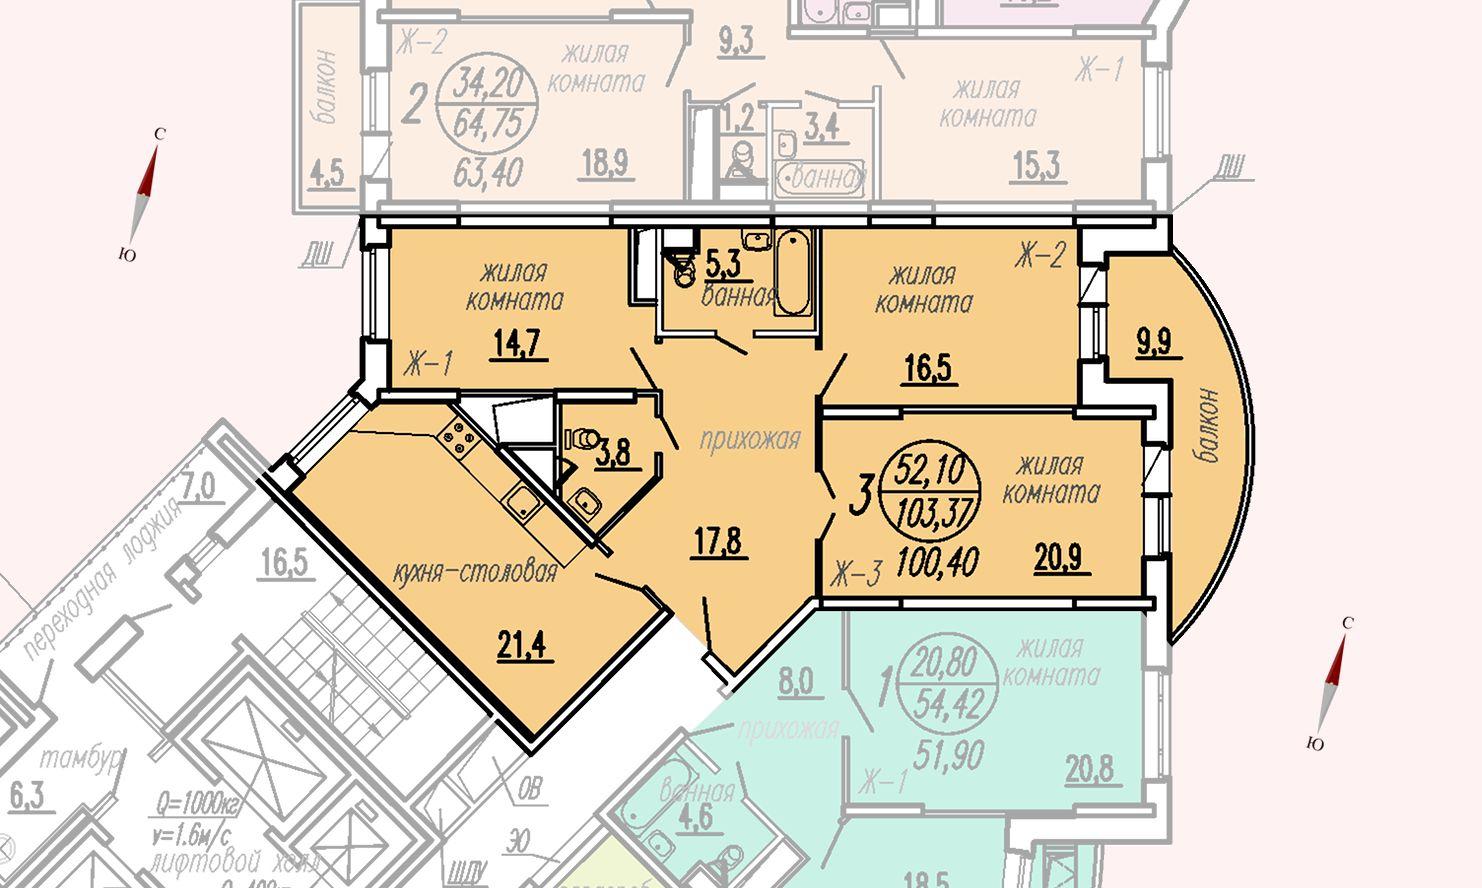 ул. Дирижабельная, д. 1, секция3, квартира 103,37 м2